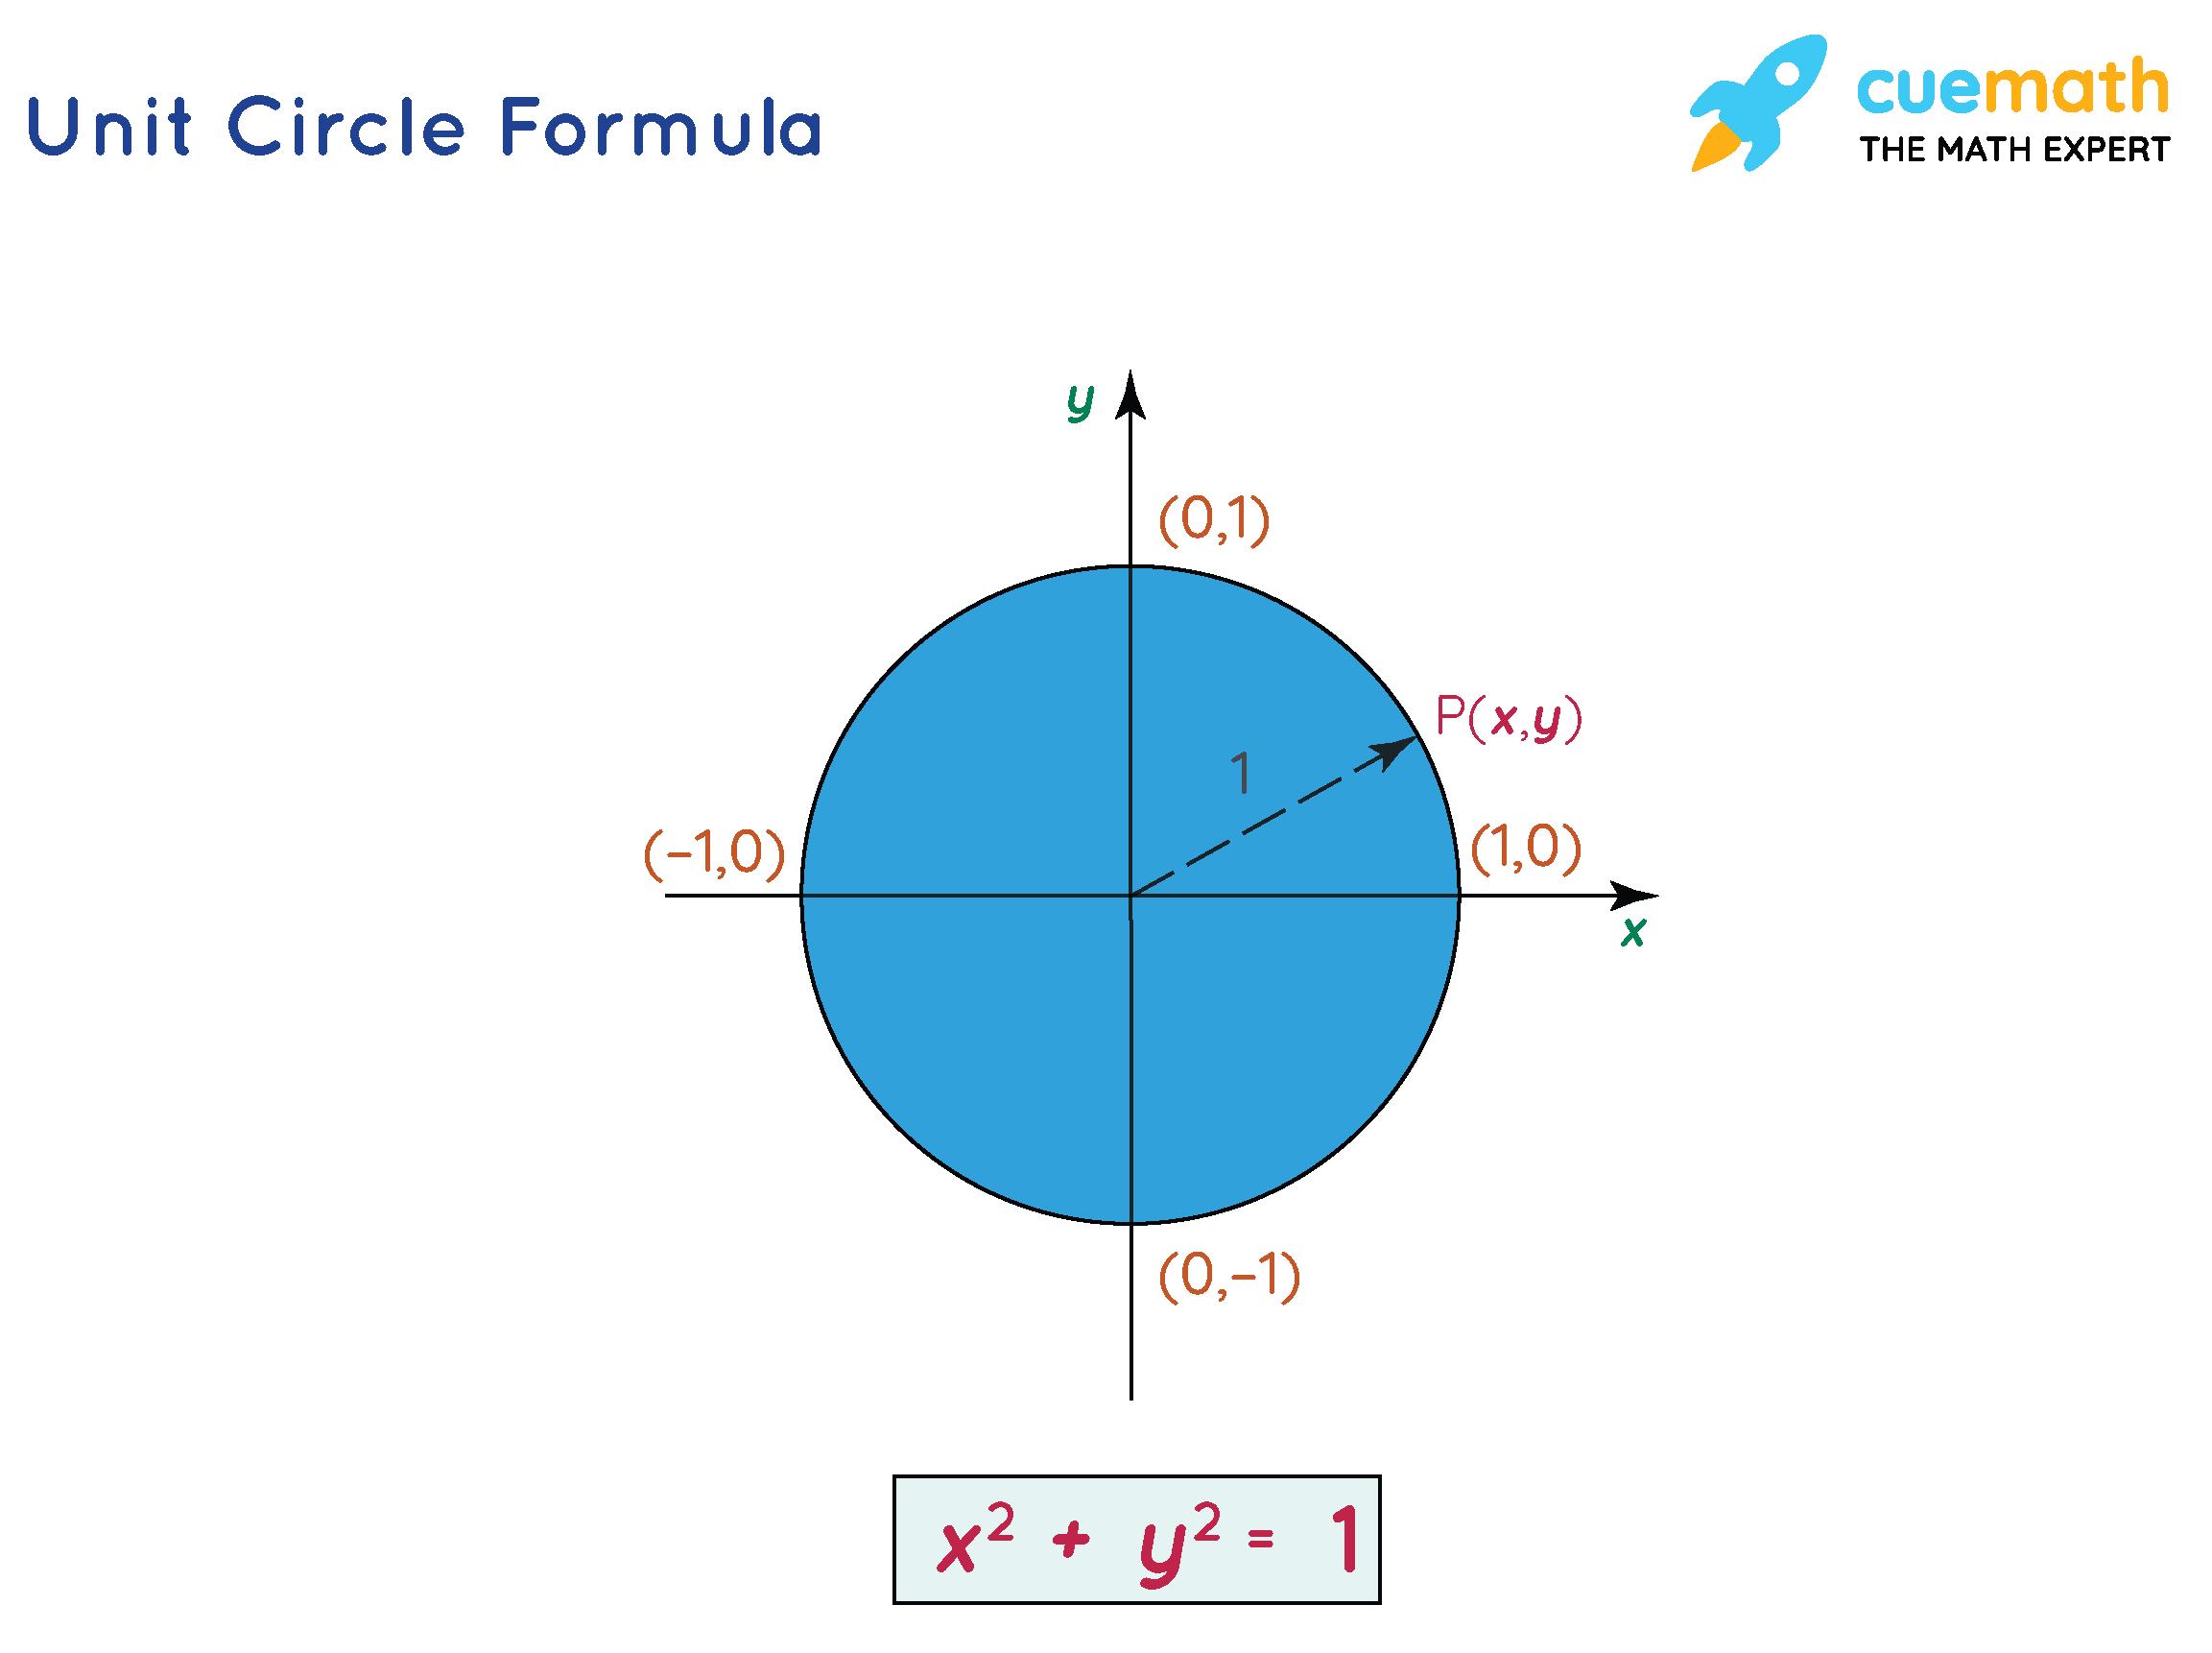 Unit circle formula - the centre lies at (0,0) and the radius is 1 unit.